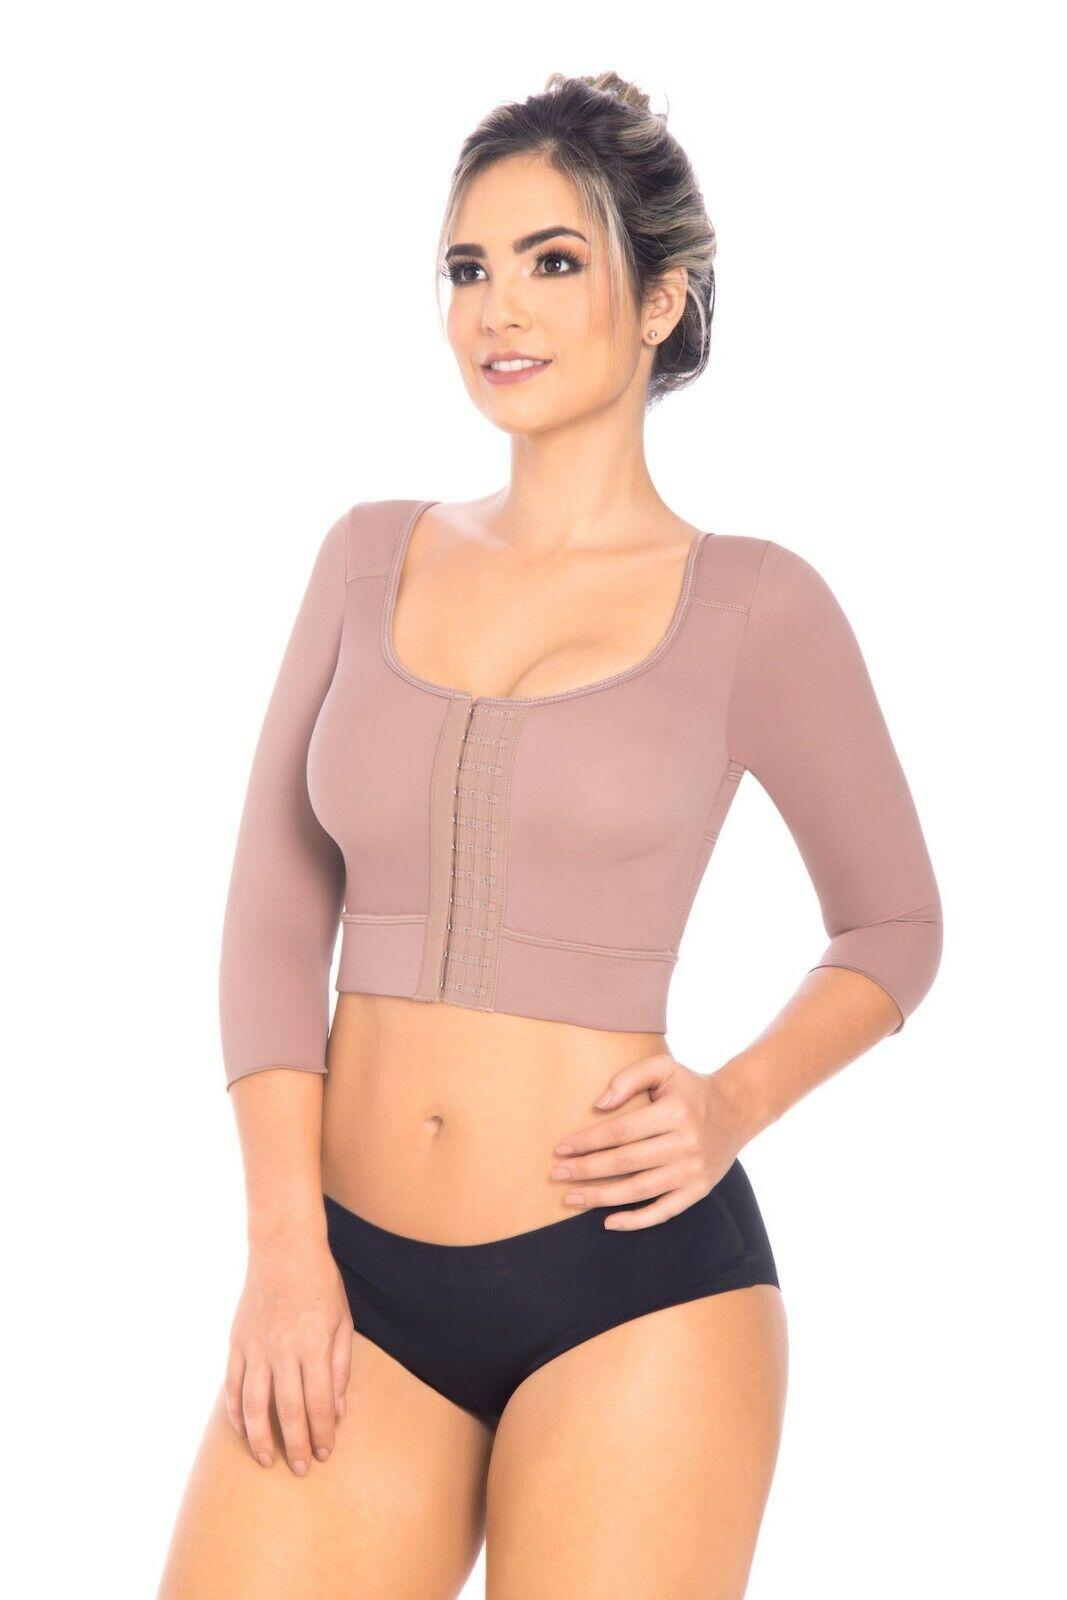 fajas post surgery compression and posture bra